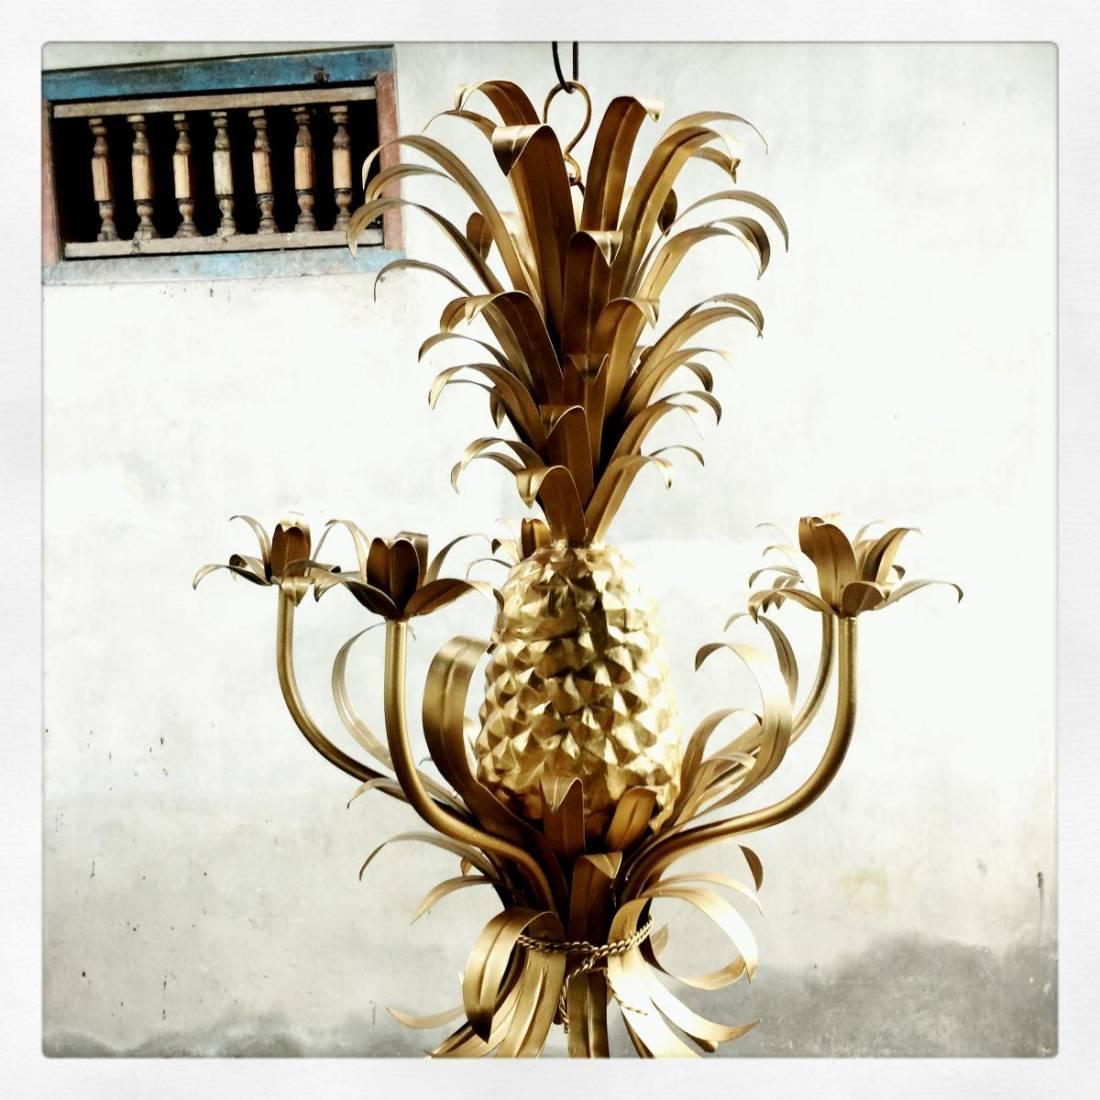 Miami Shores Pineapple Chandelier - 5 x light - Handwelded iron